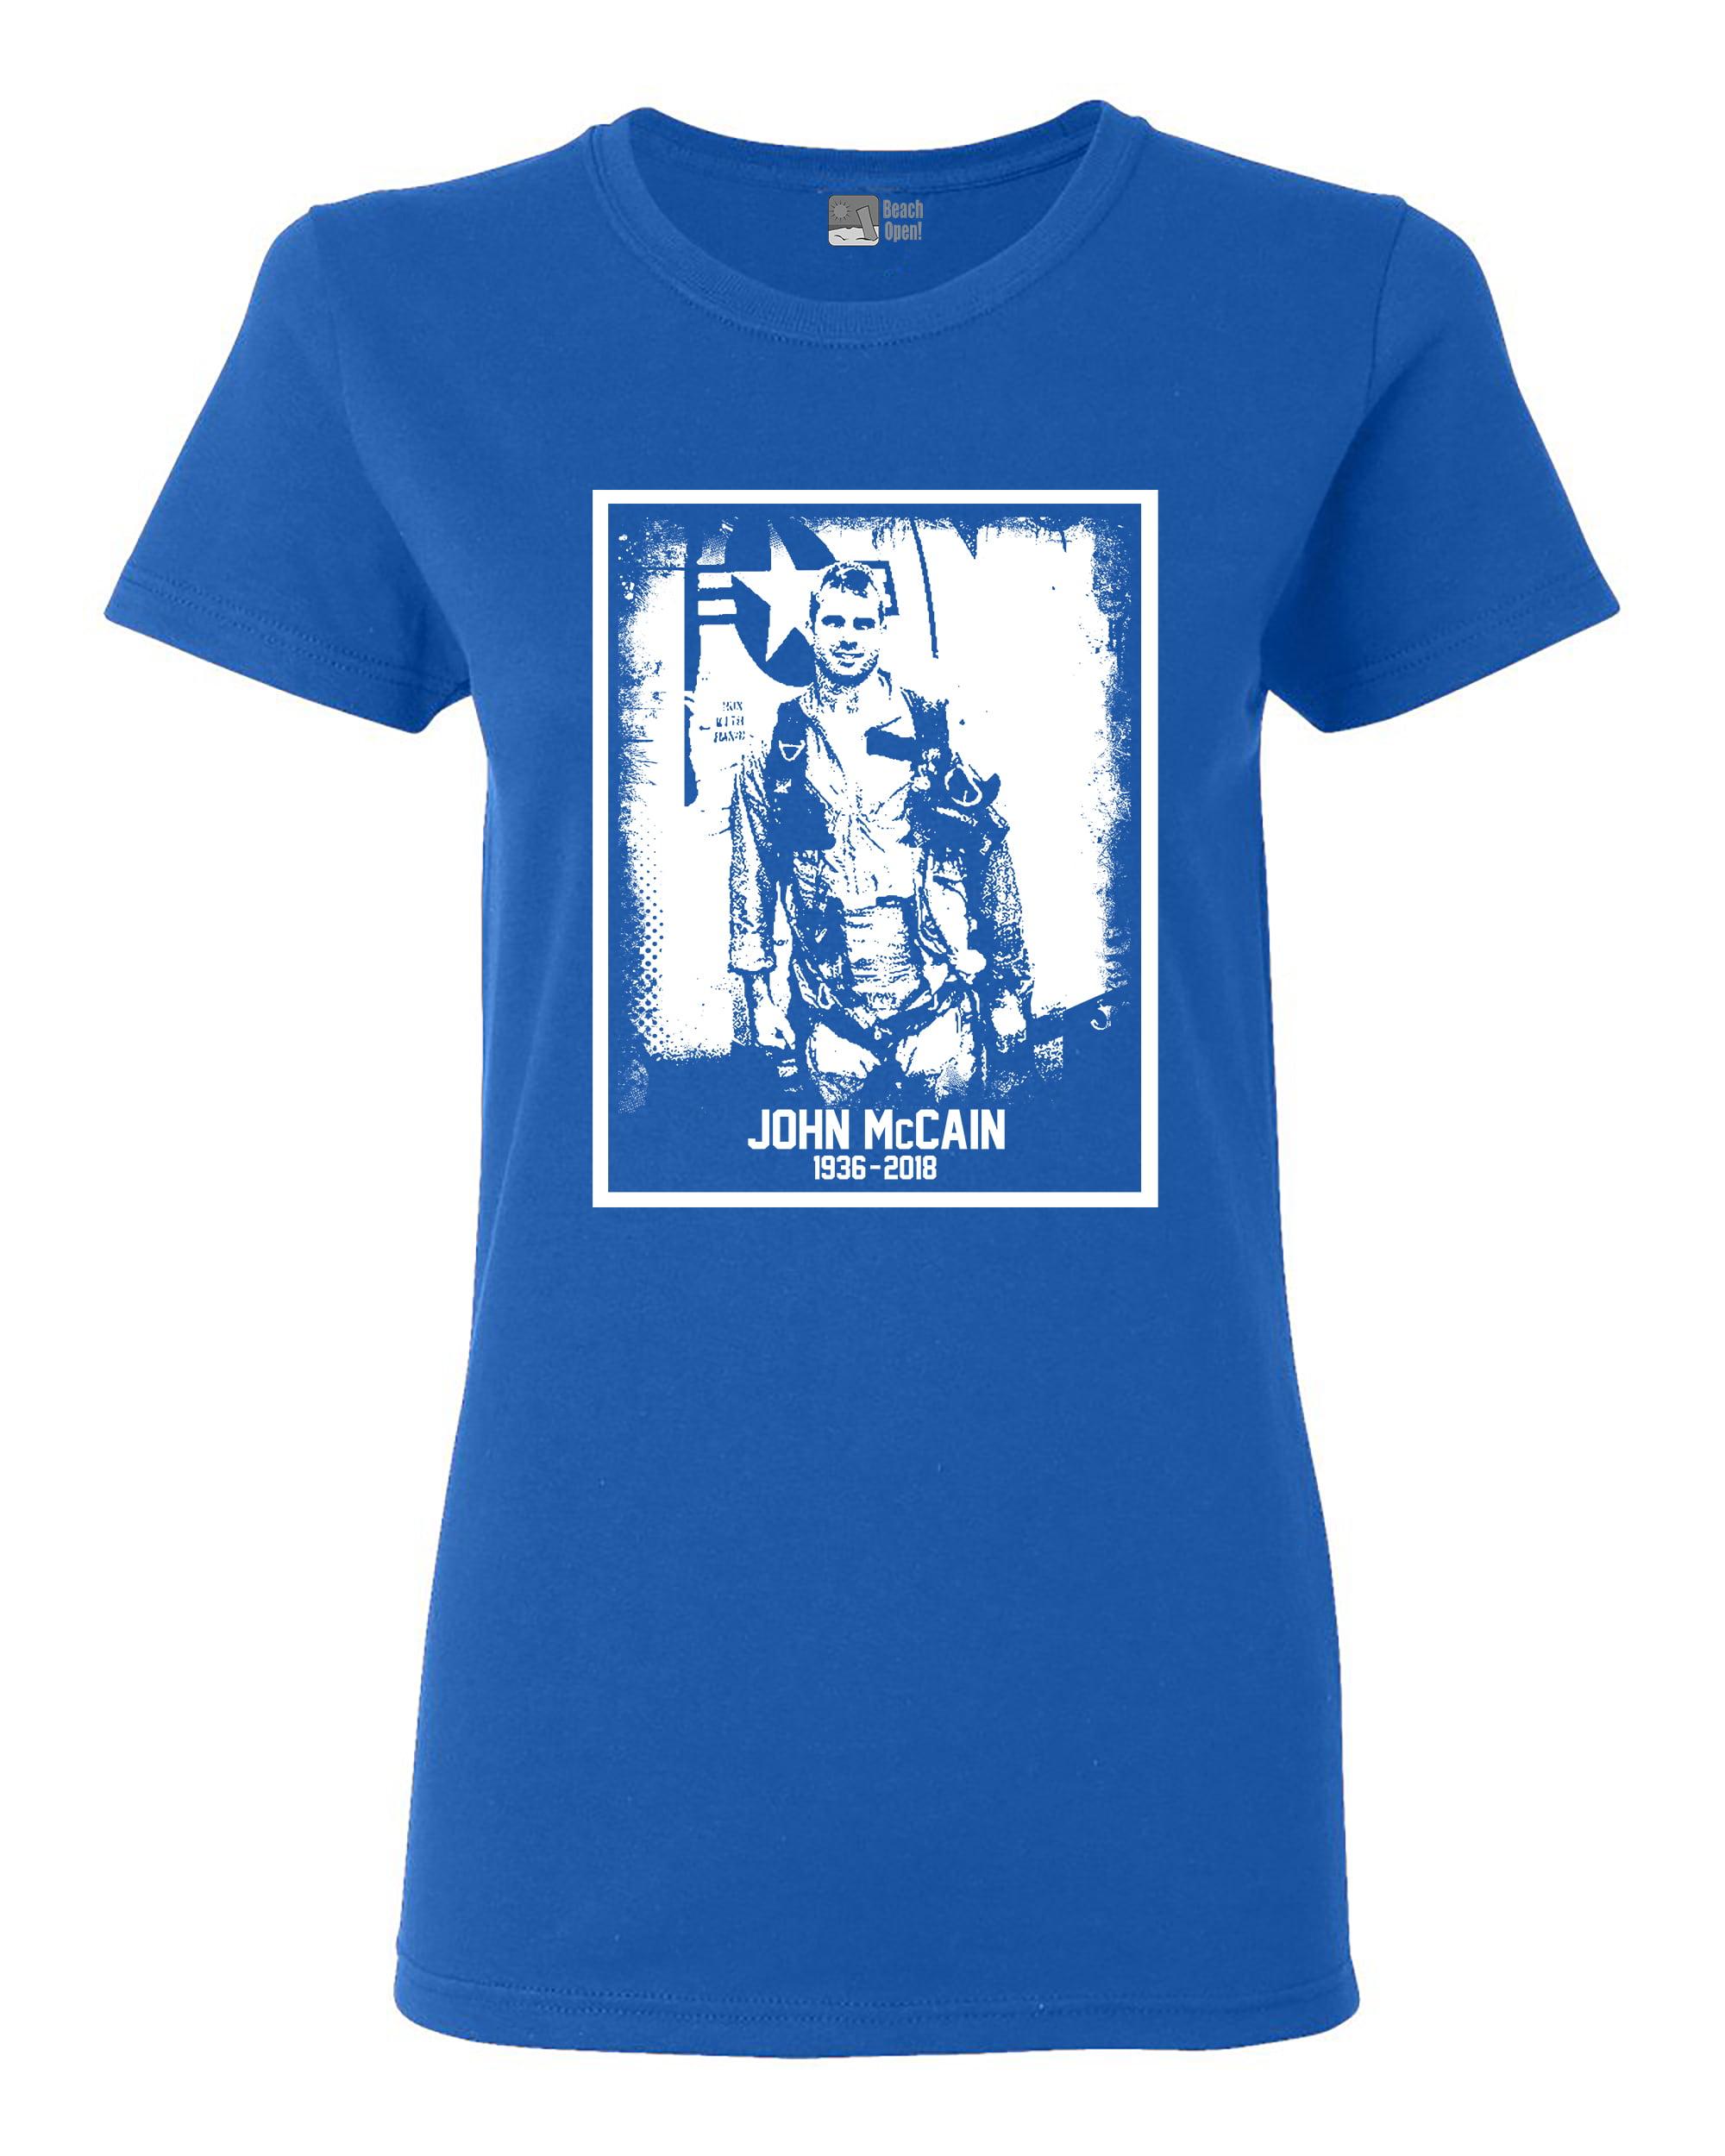 Ladies John McCain Senator USA Flag RIP 1936-2018 Hero White DT T-Shirt Tee